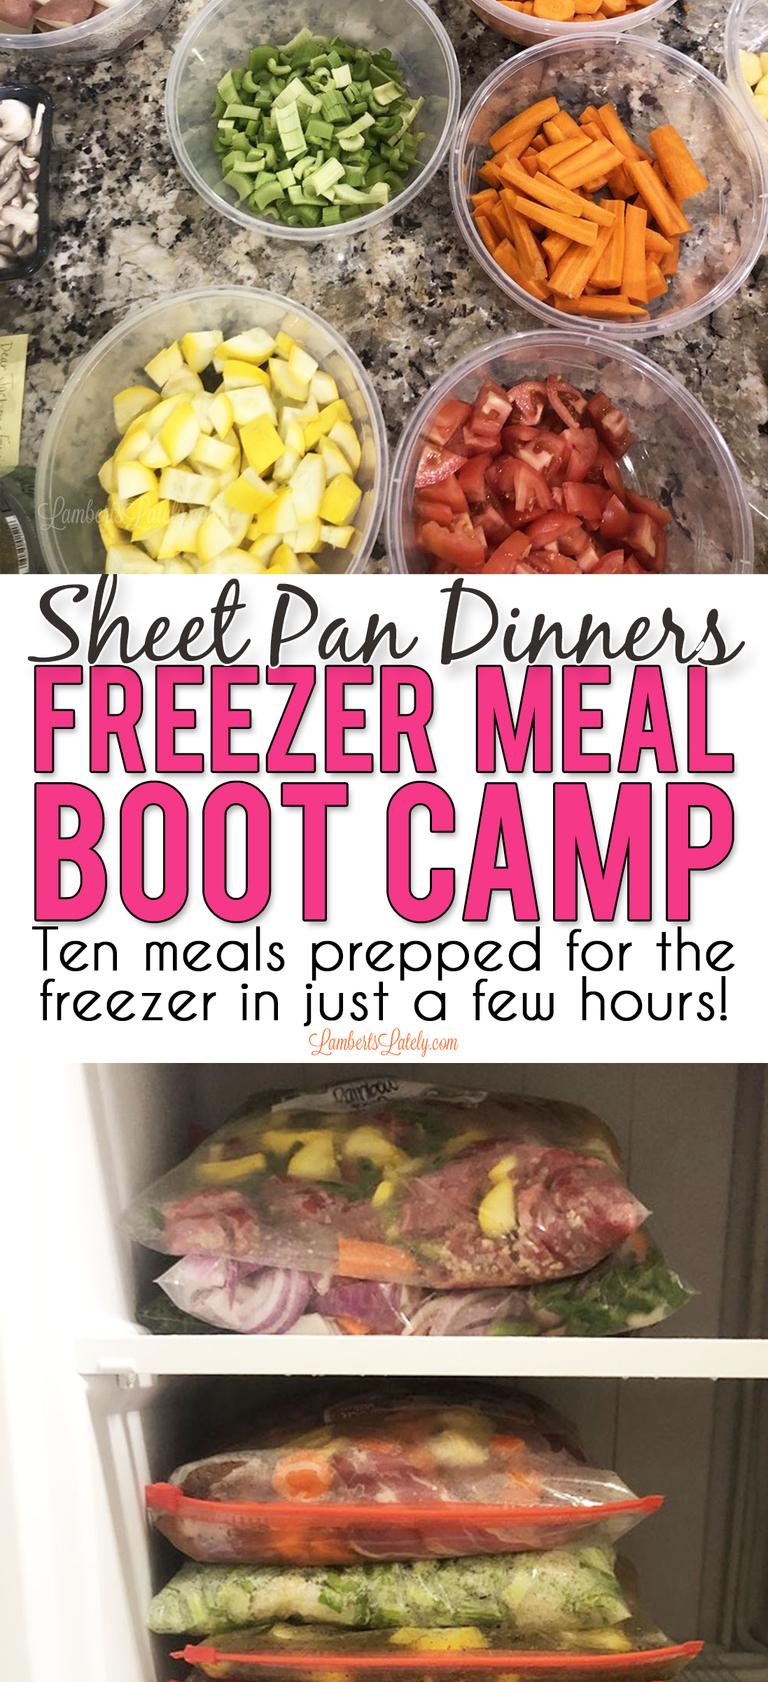 Photo of Sheet Pan Dinners Freezer Meal Boot Camp